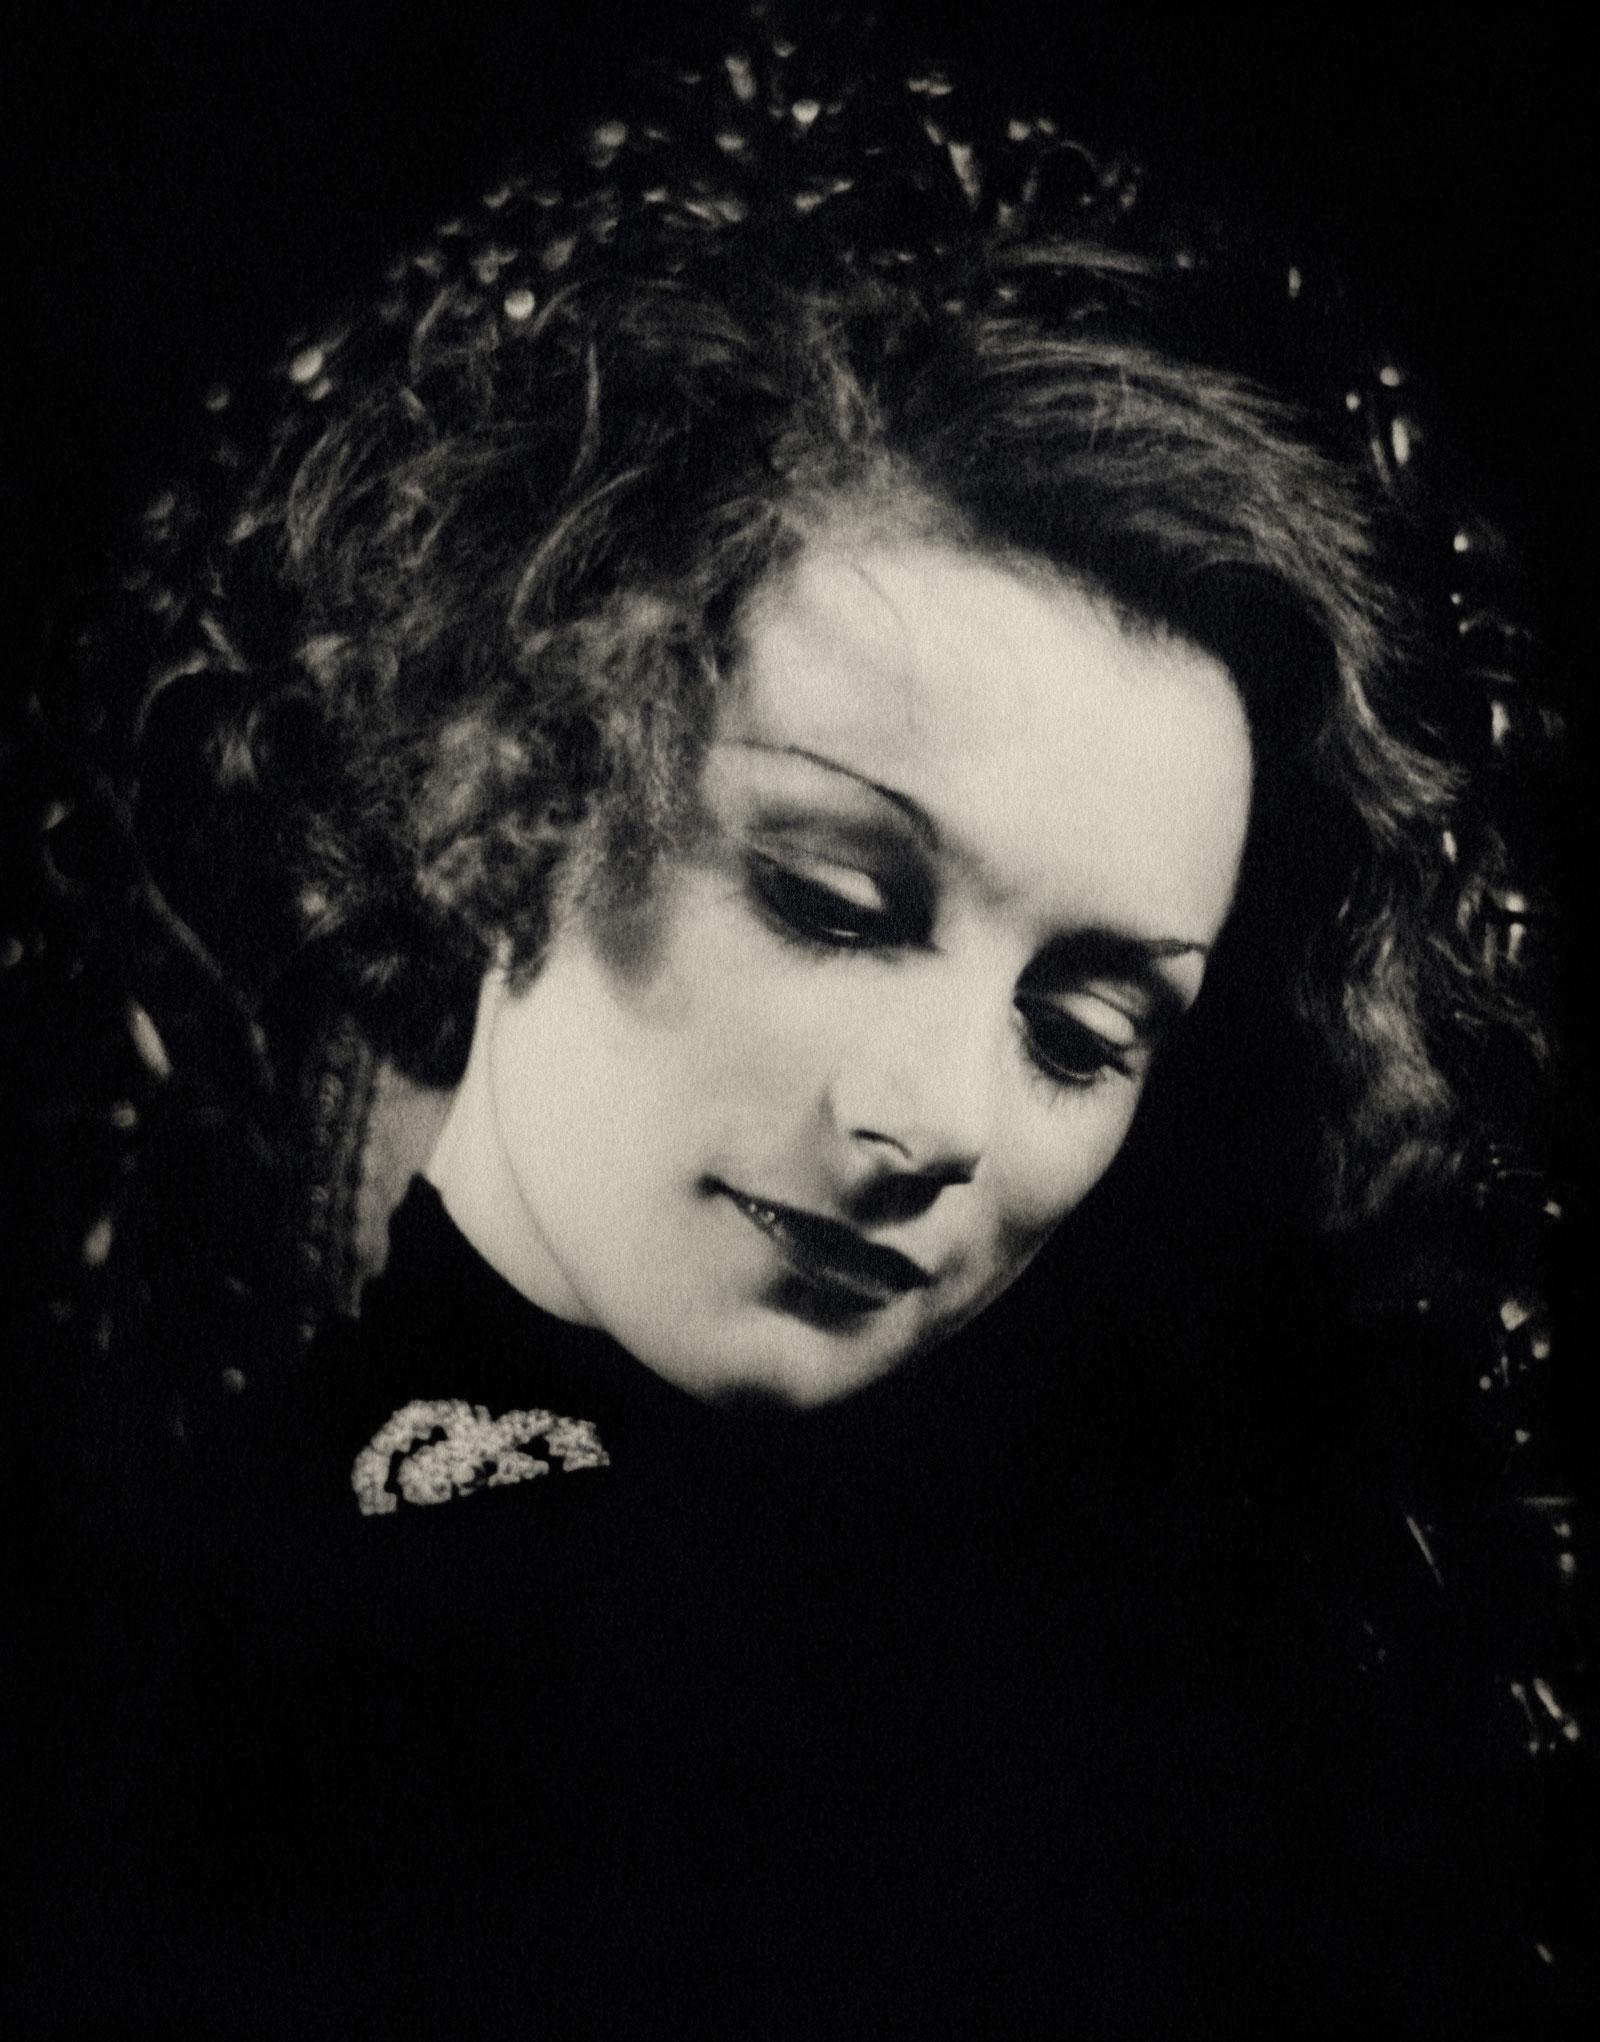 sternberger-woman